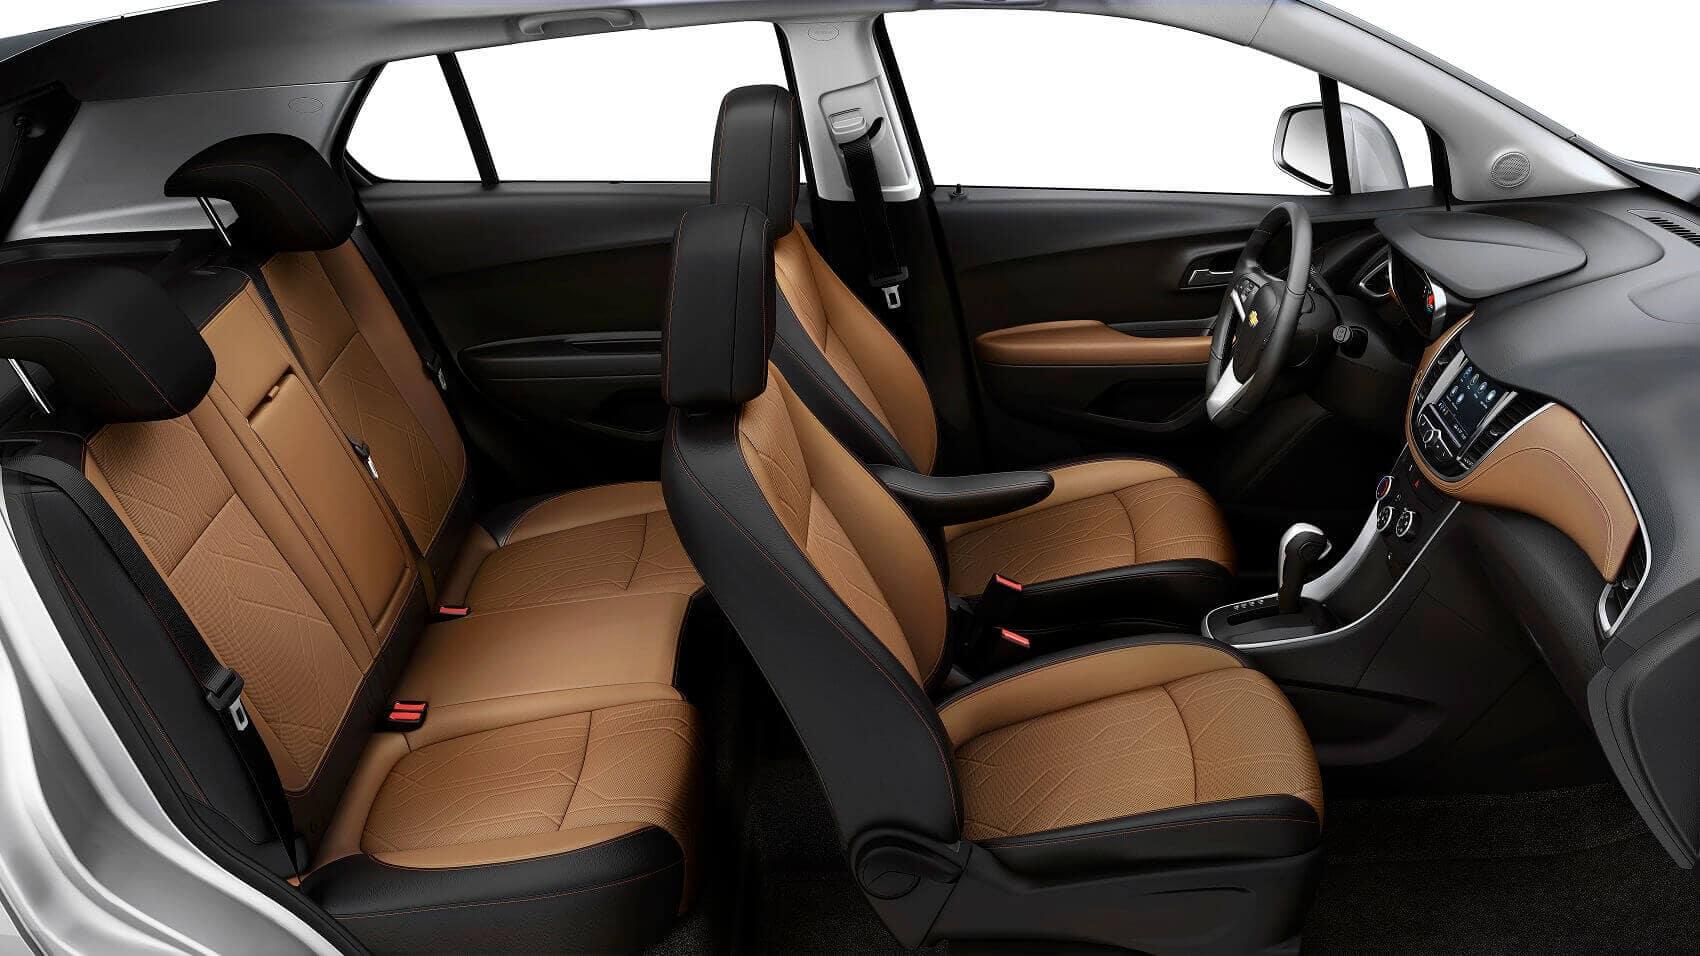 Chevrolet Trax Interior Space